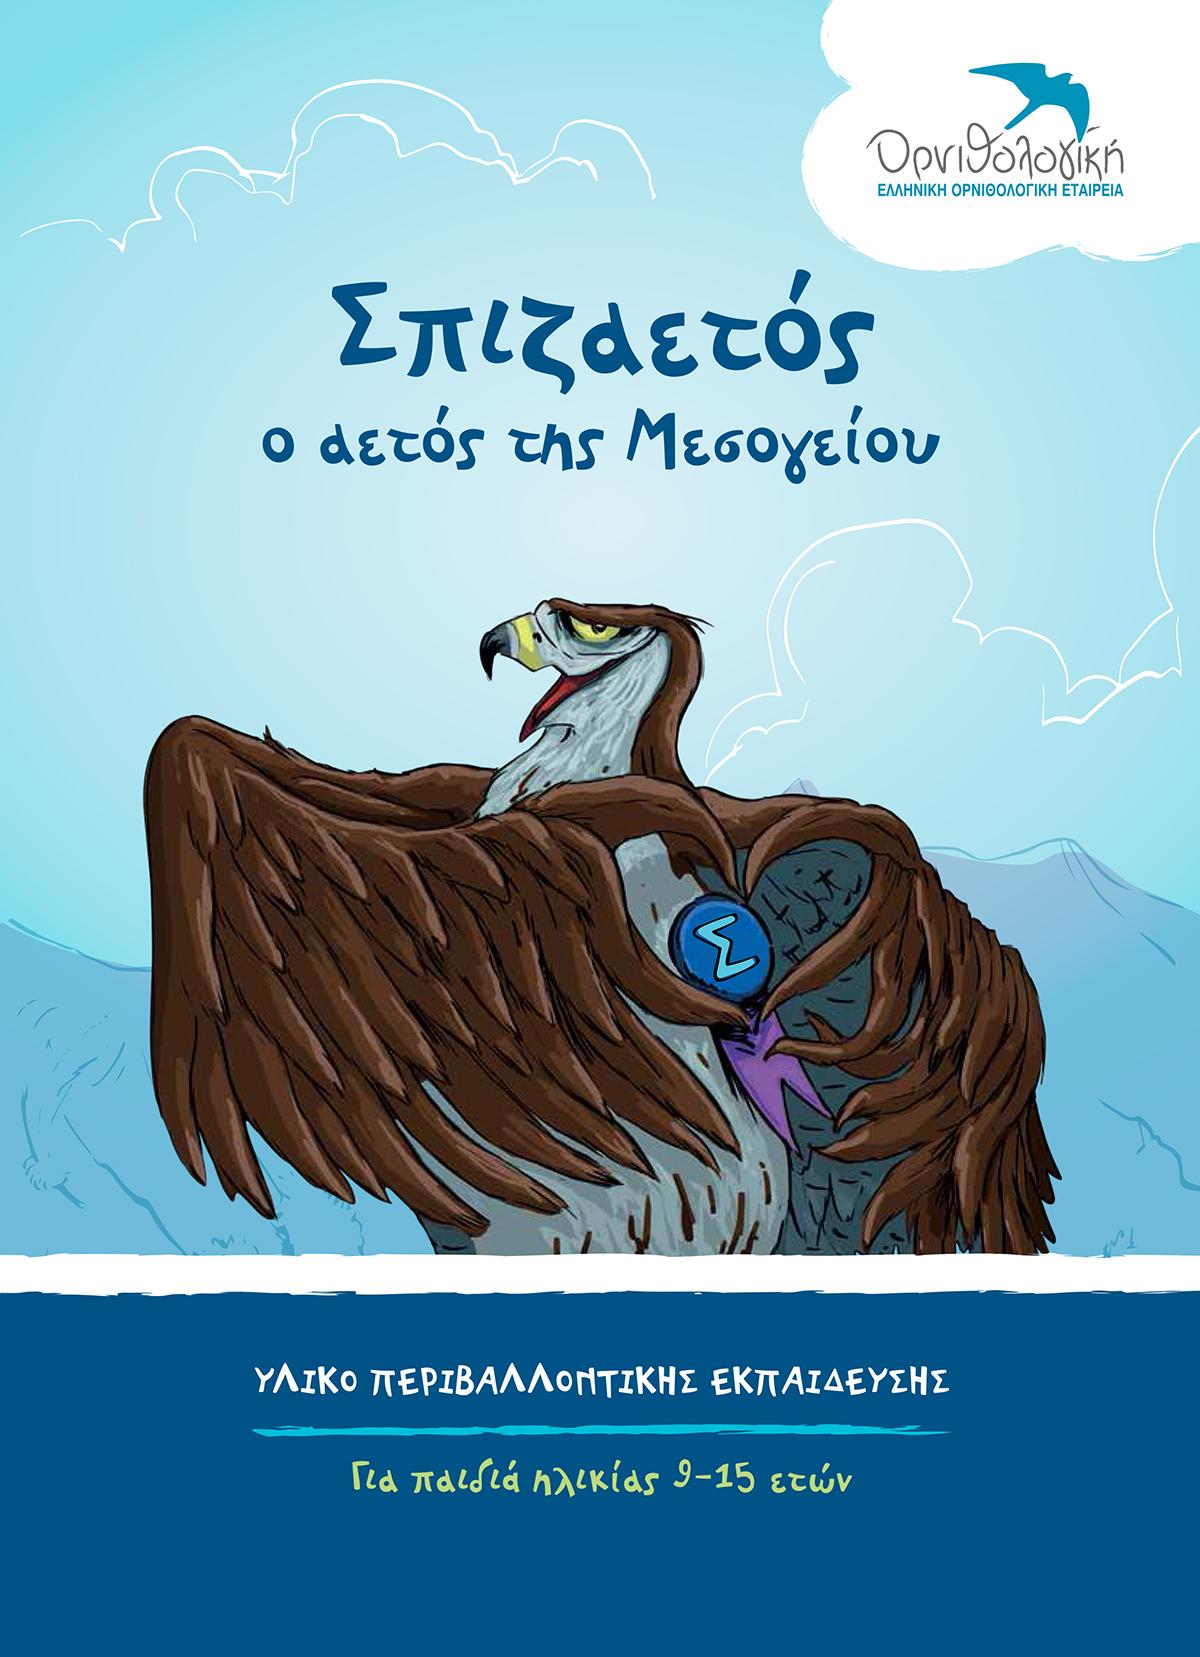 Yliko PE Spizaetos Booklet